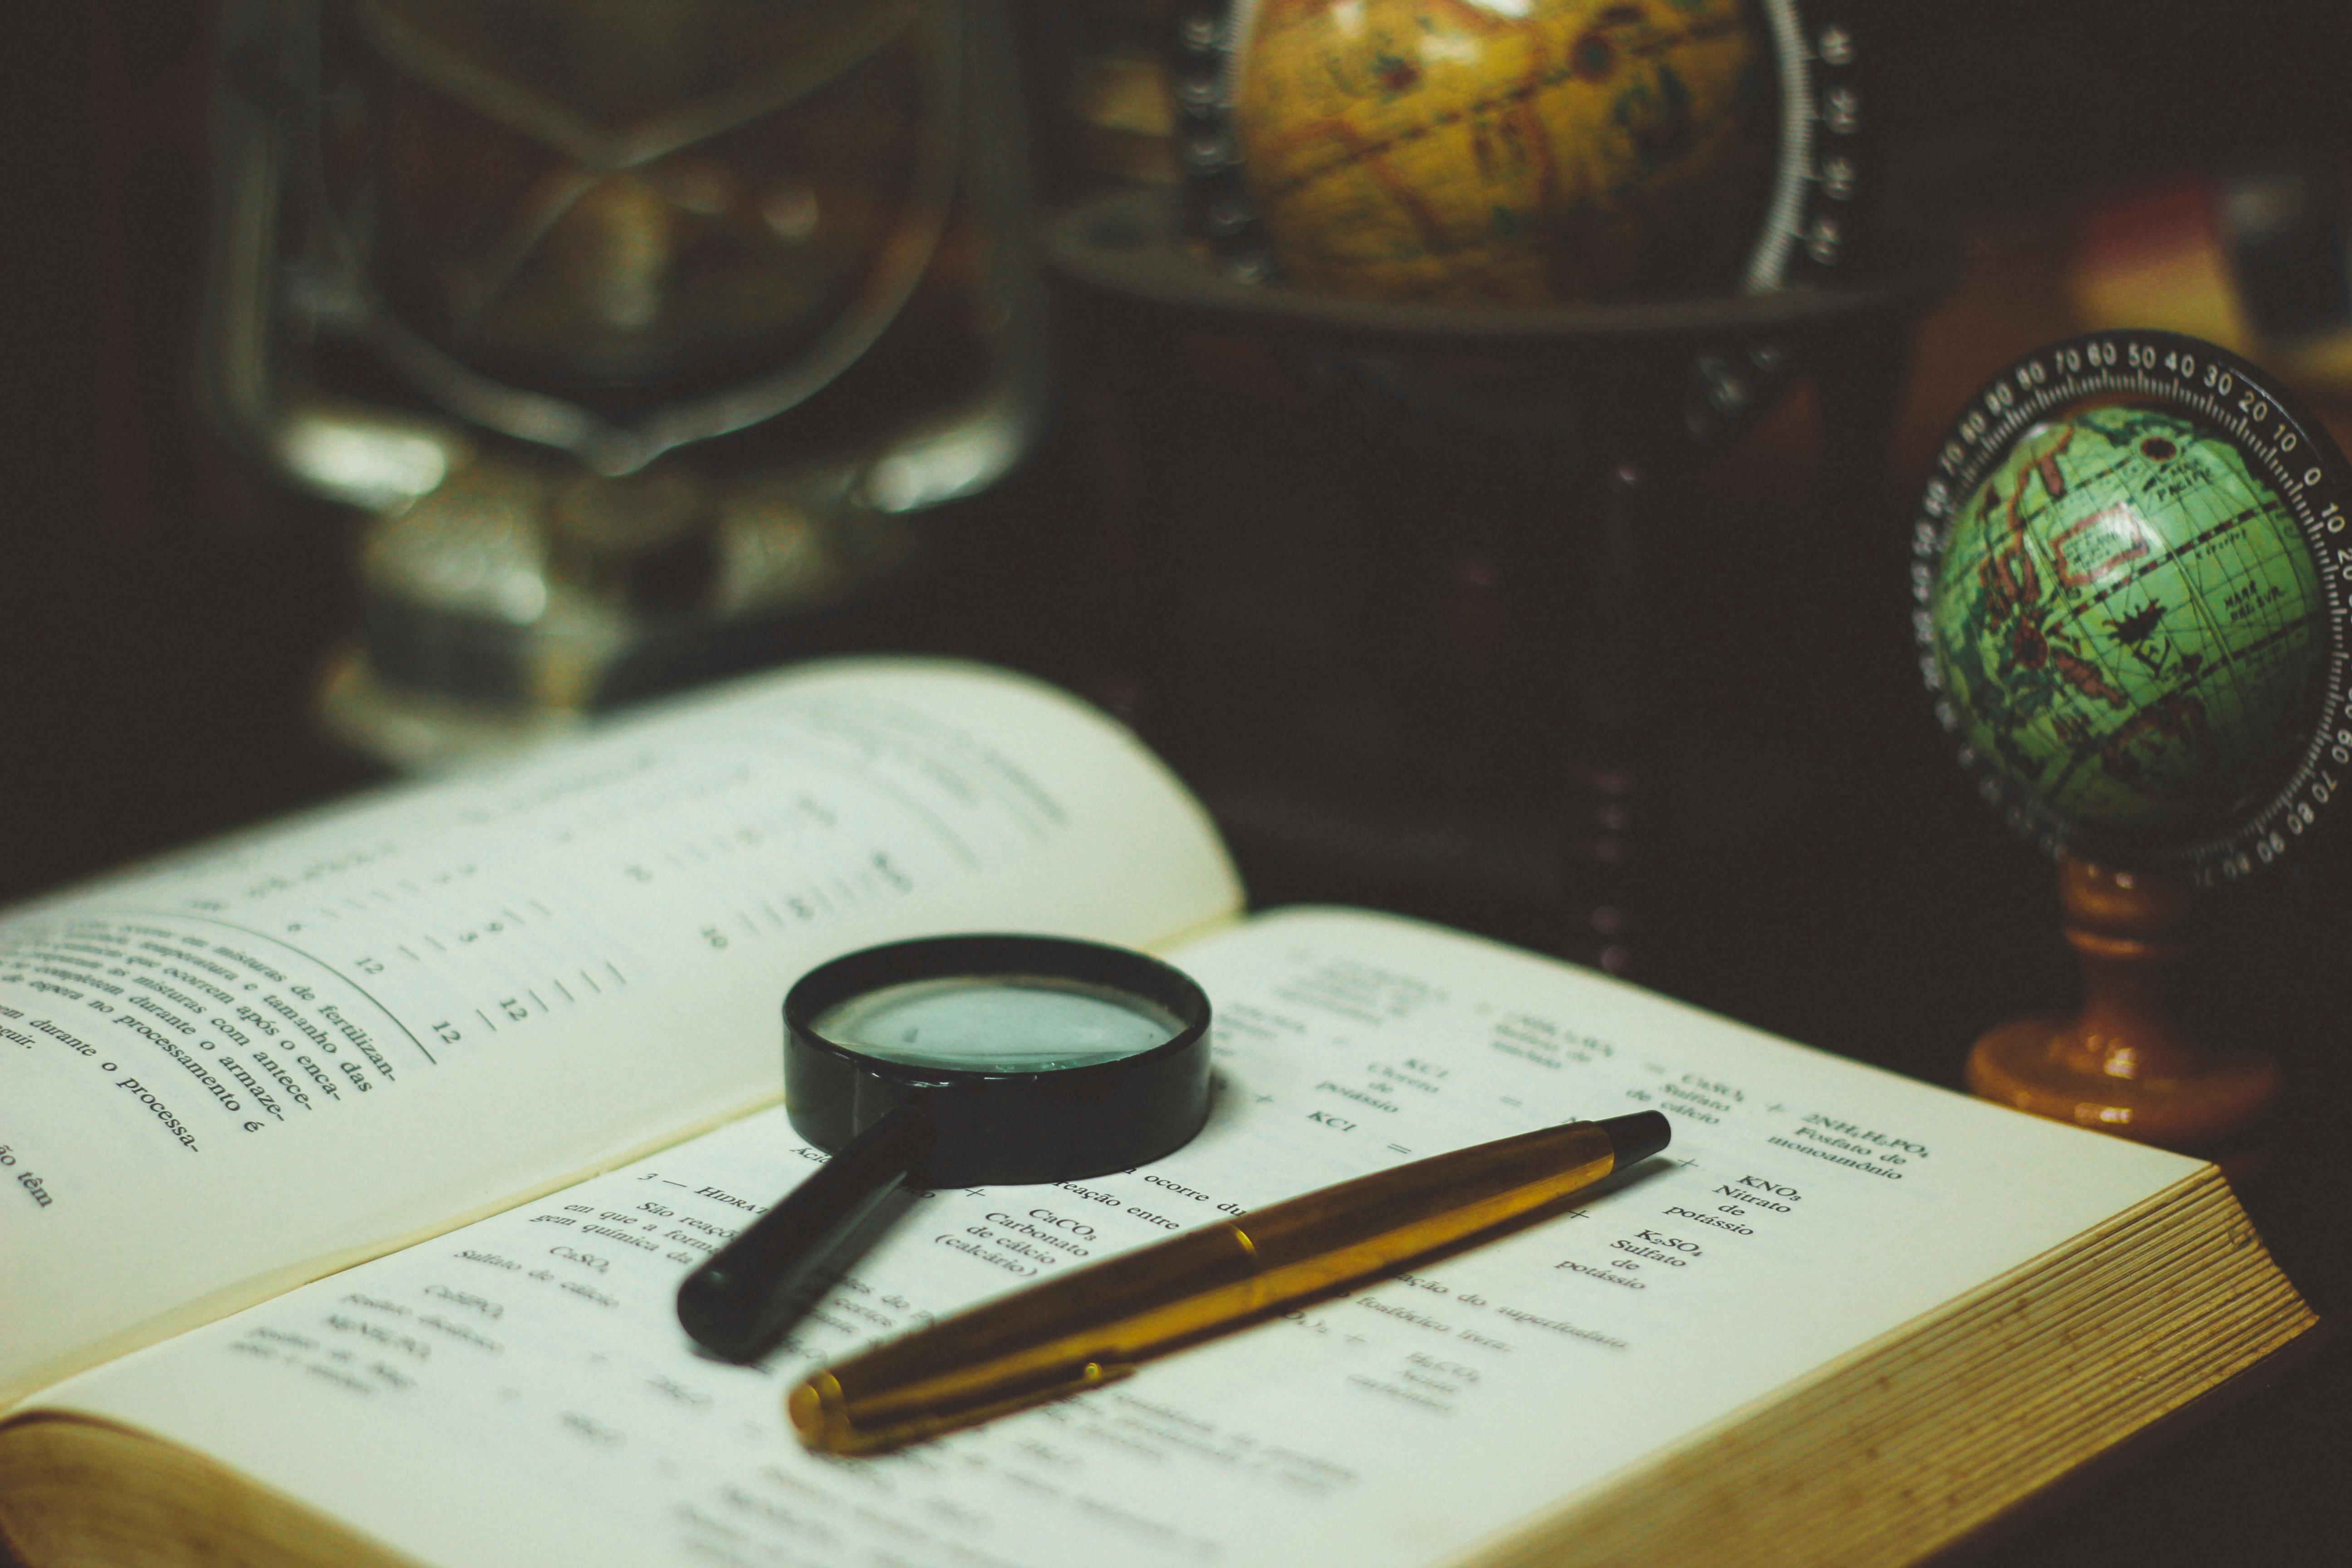 Free SEO Keyword Research Tool - Jaaxy